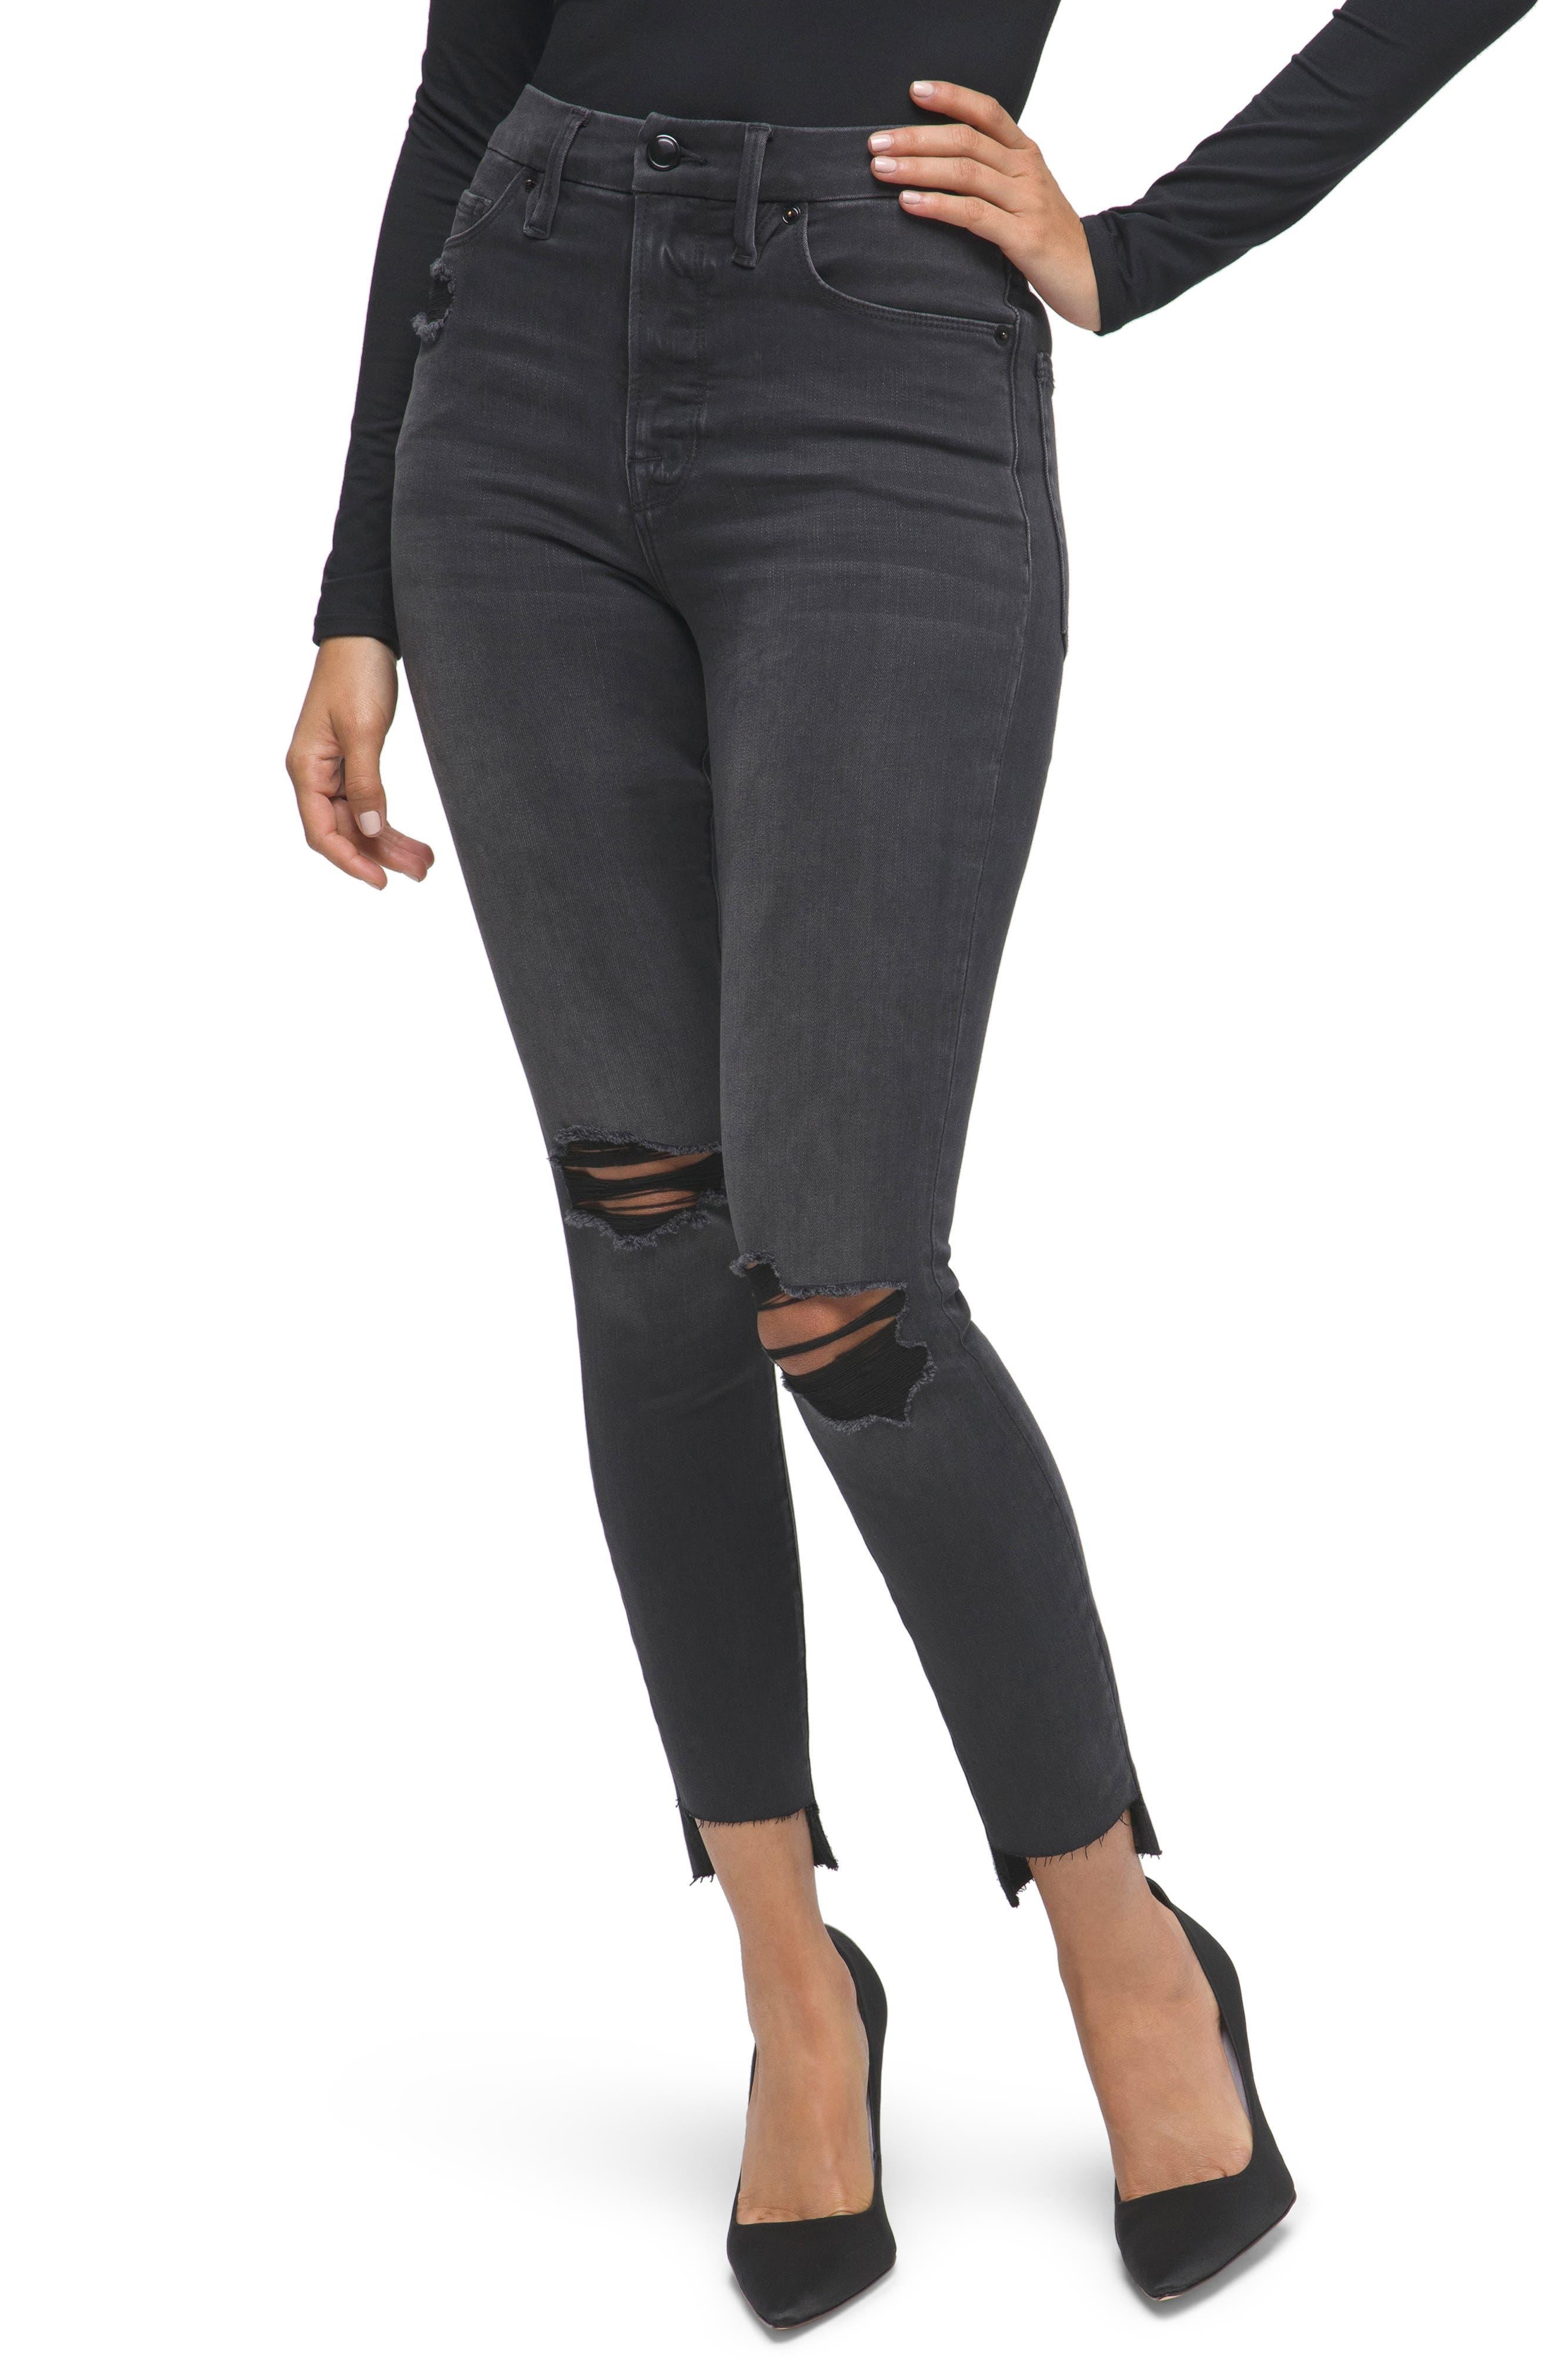 Women's Good American Good High Waist Crop Skinny Jeans